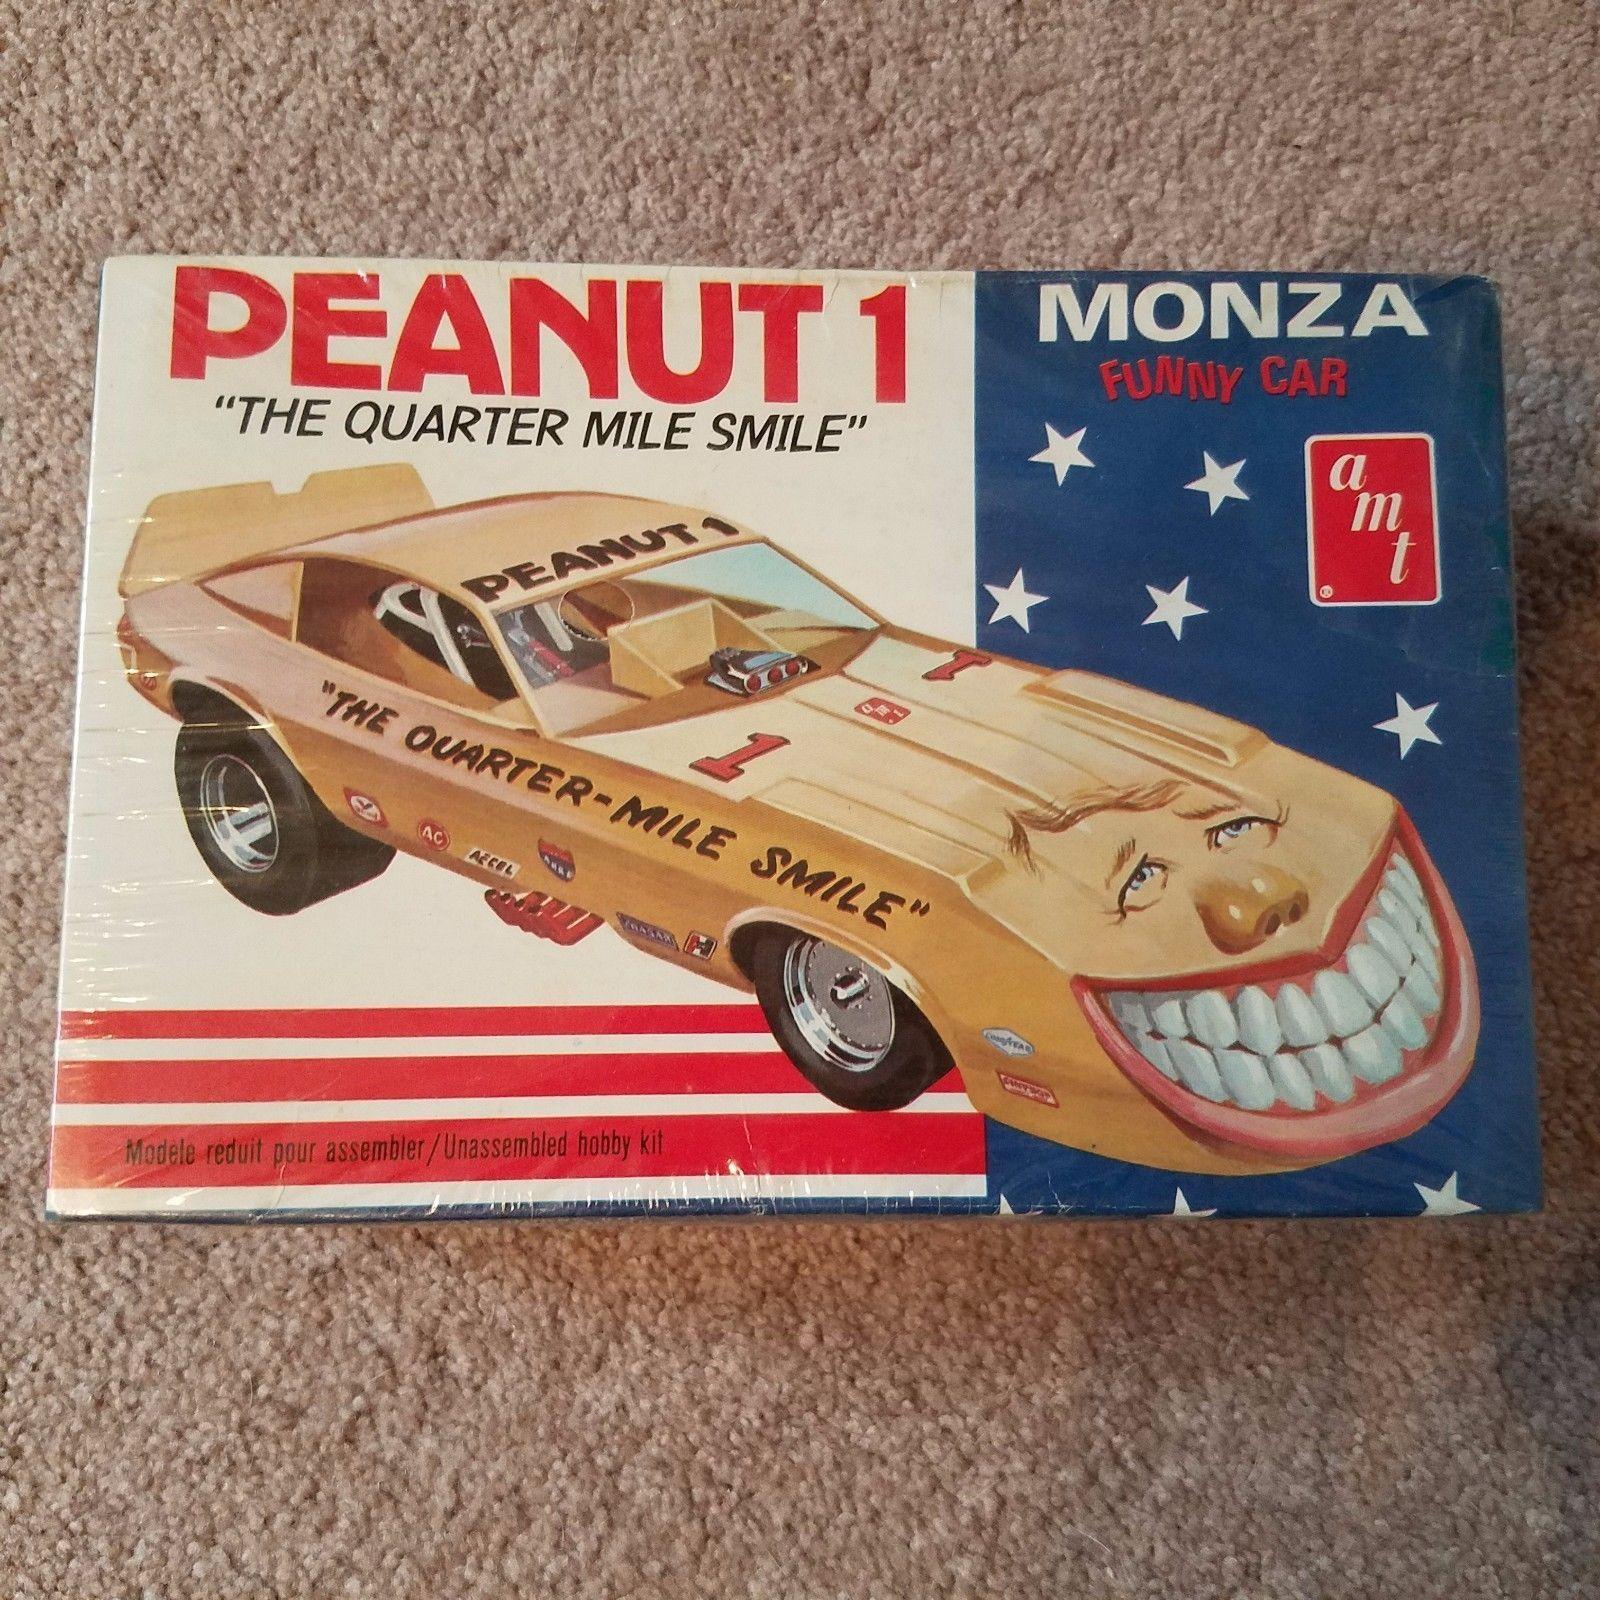 Vintage AMT Chevrolet Monza Funny Car Model Car Kit Peanut 1 Jimmy